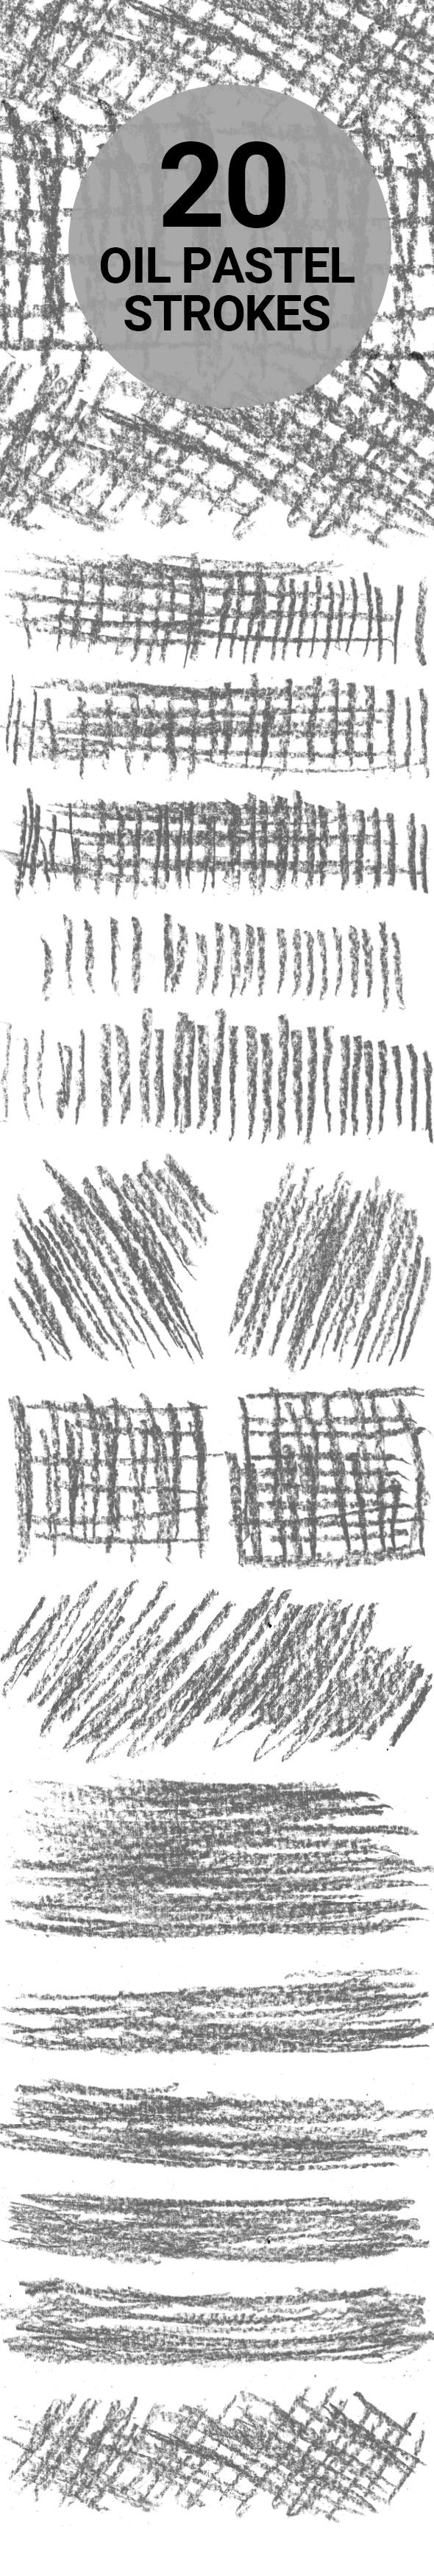 oil-pastel-strokes-large